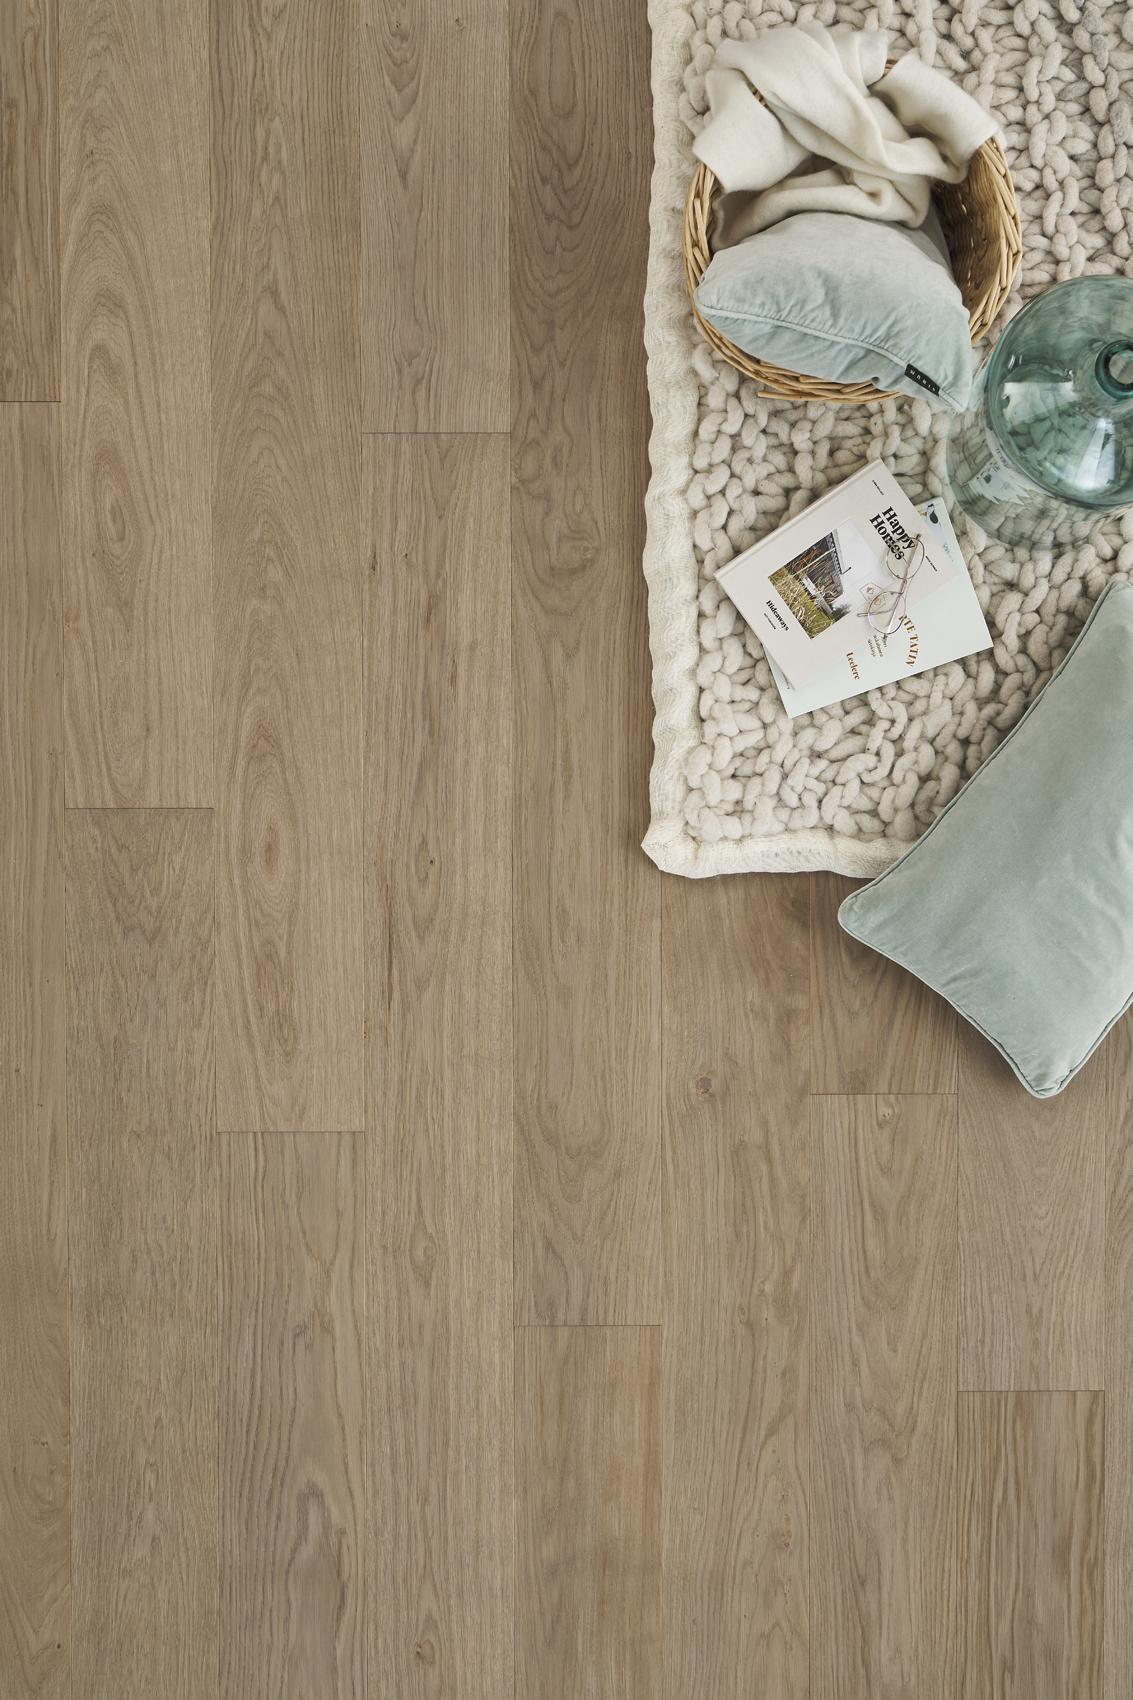 Timberwise parketti puulattia wooden floor parquet Tammi Oak Amore Brown